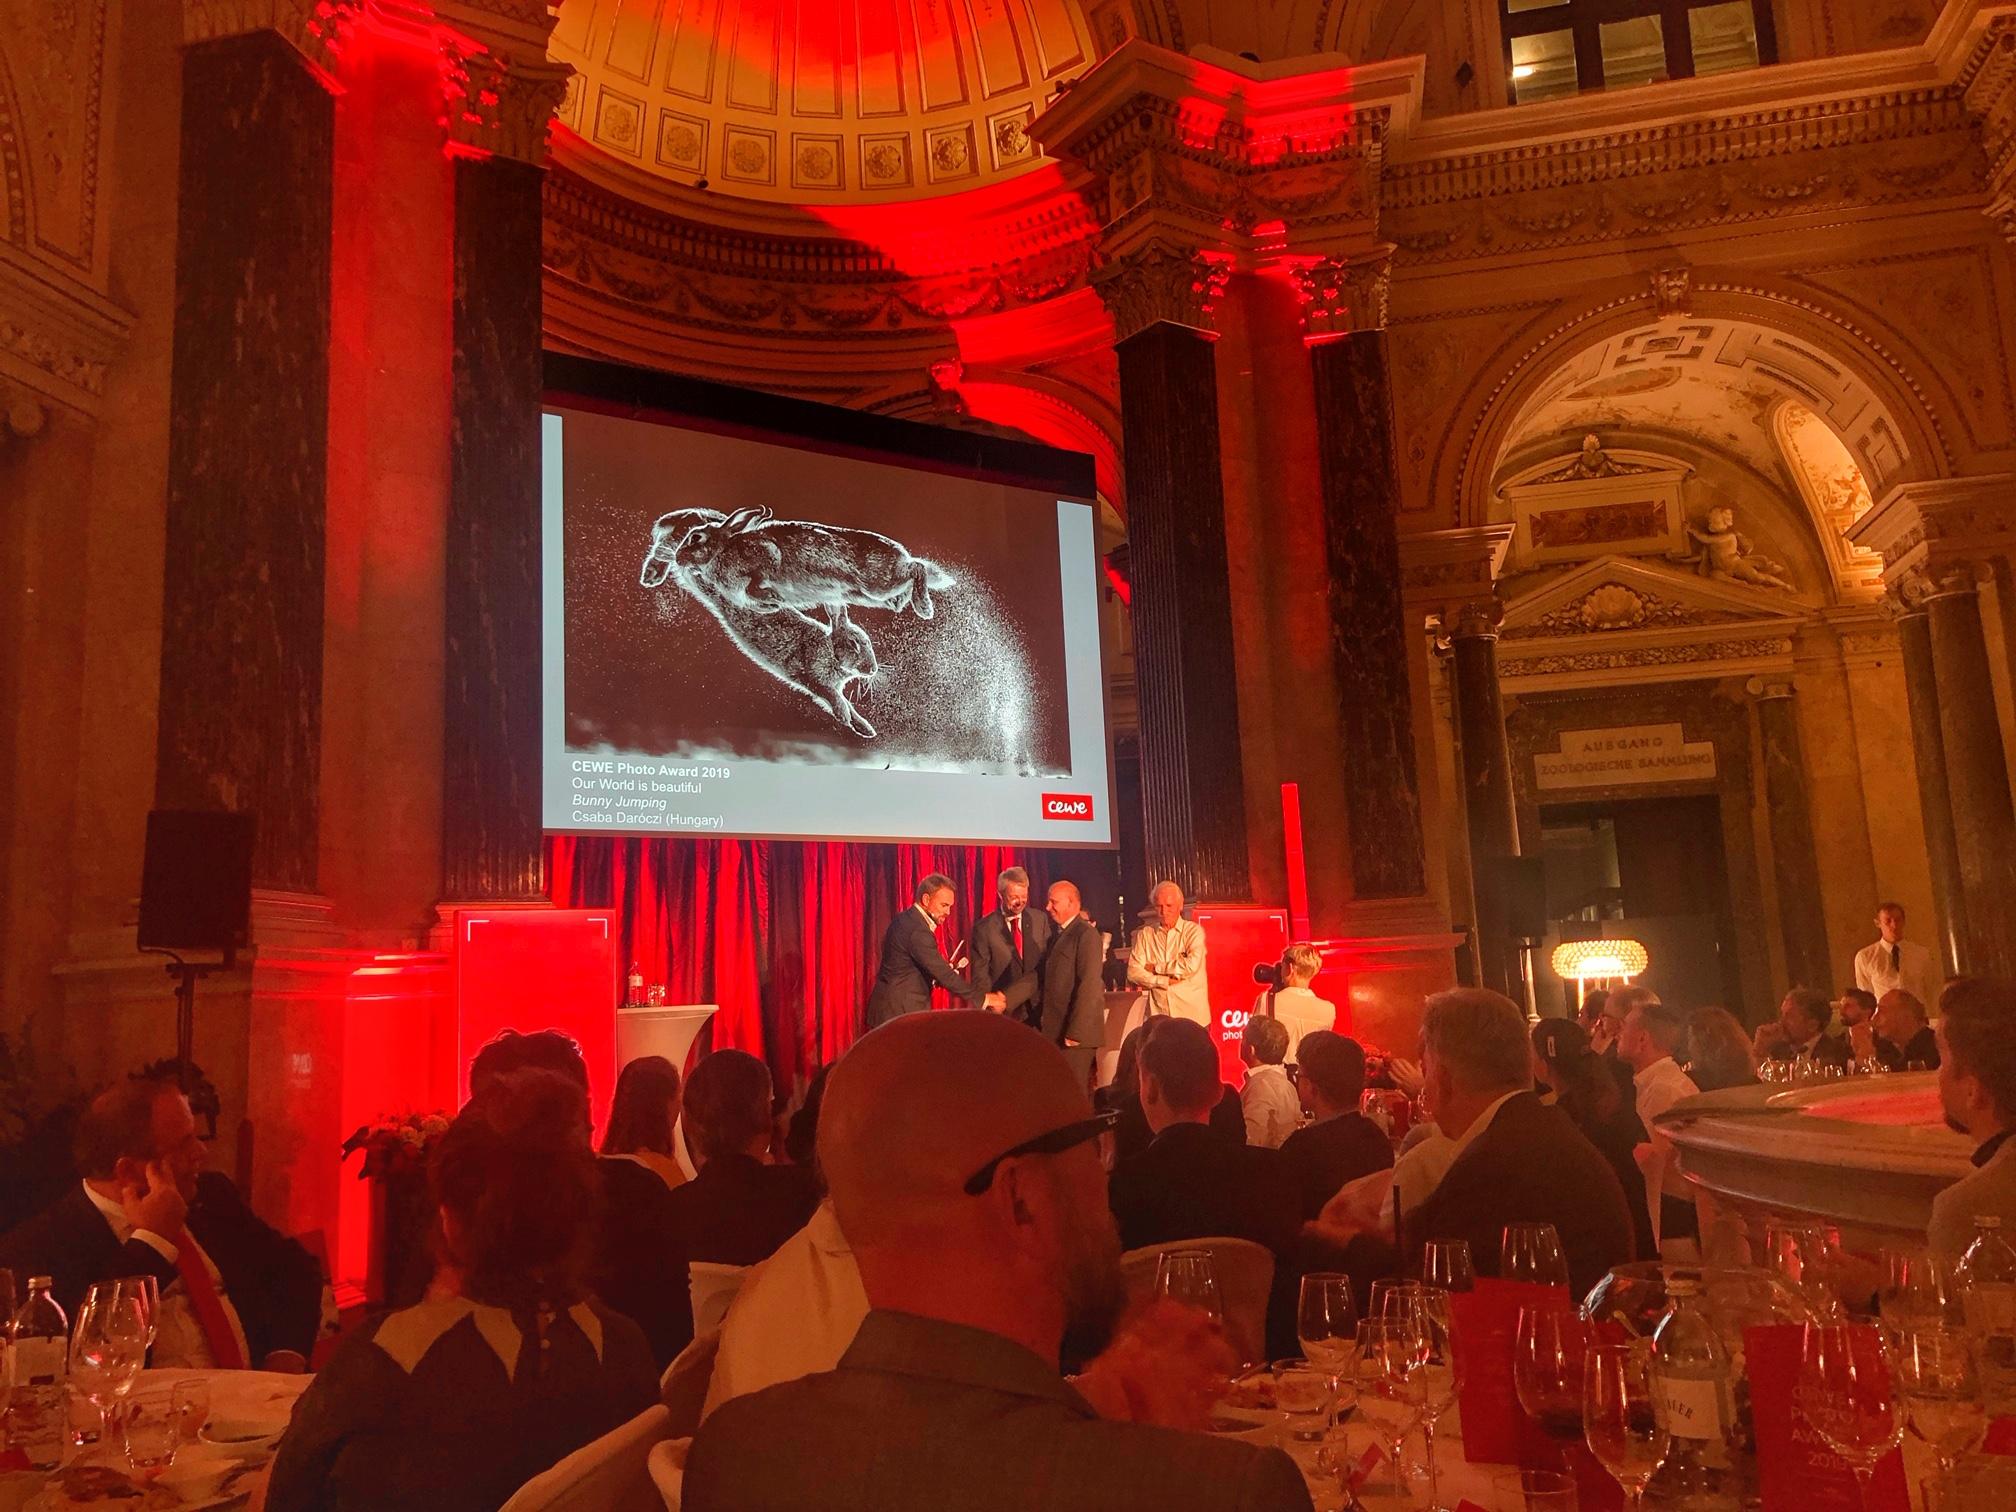 CEWE Photo Award Hasen